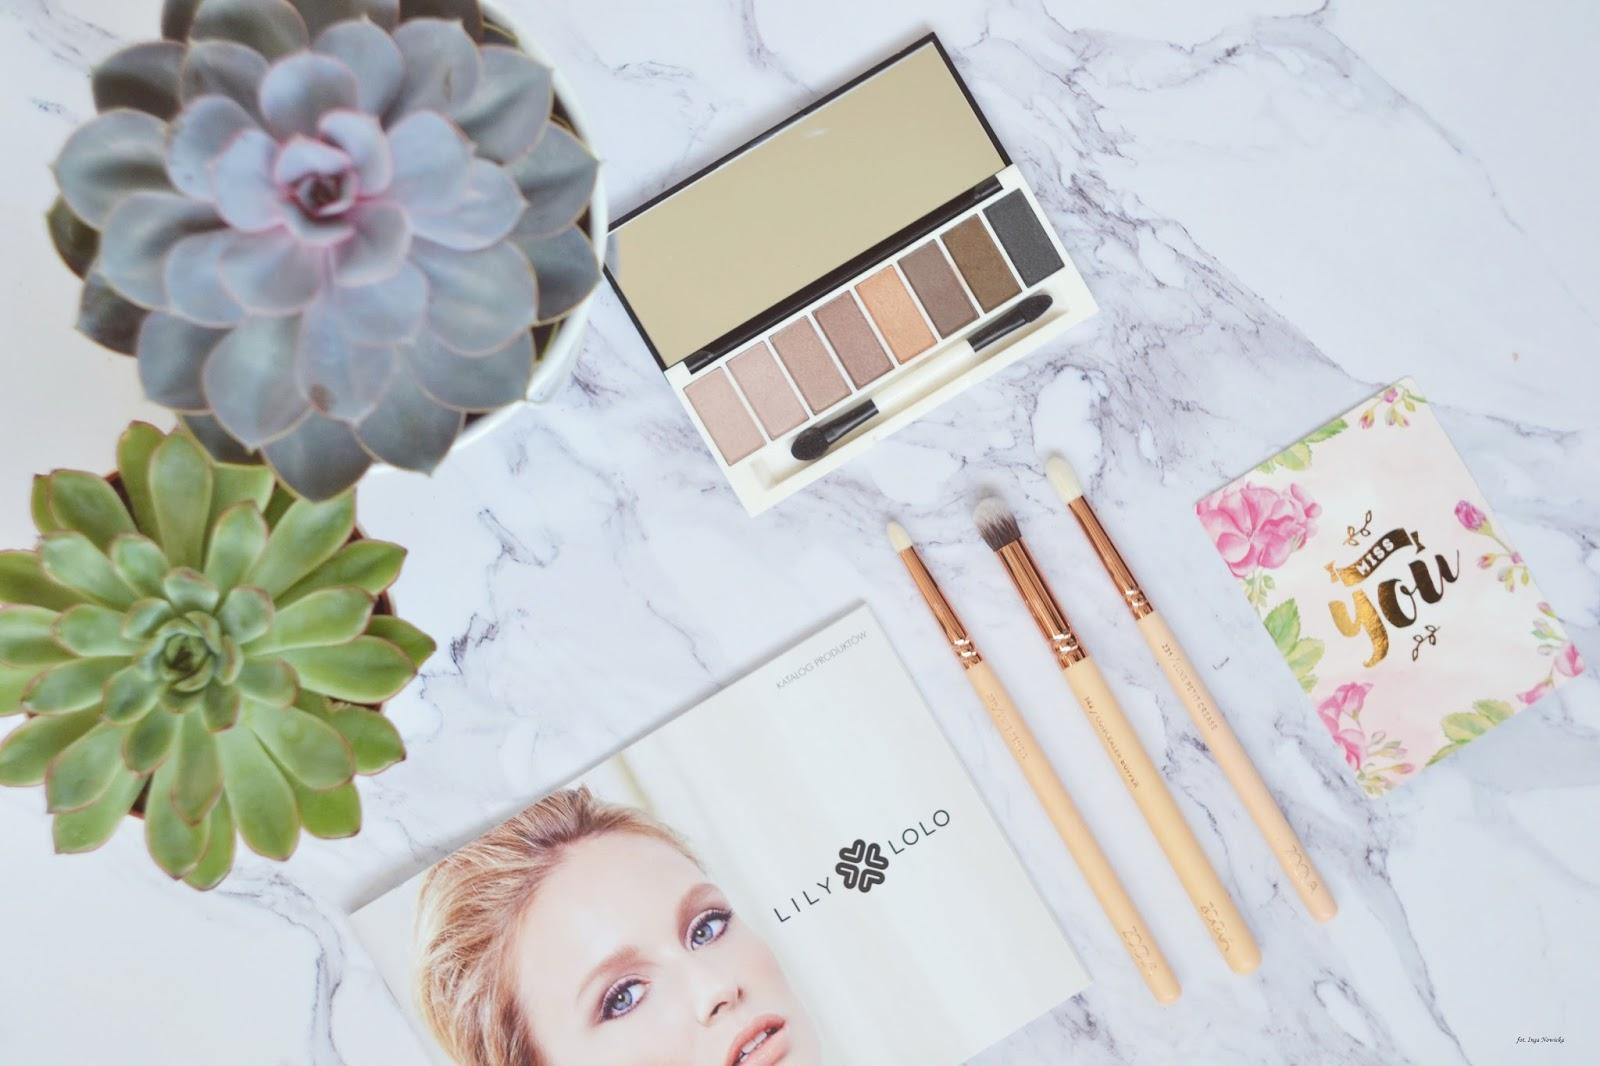 Lily Lolo - Laid Bare Eye Palette. Piękno stonowanych barw. - Like a porcelain doll